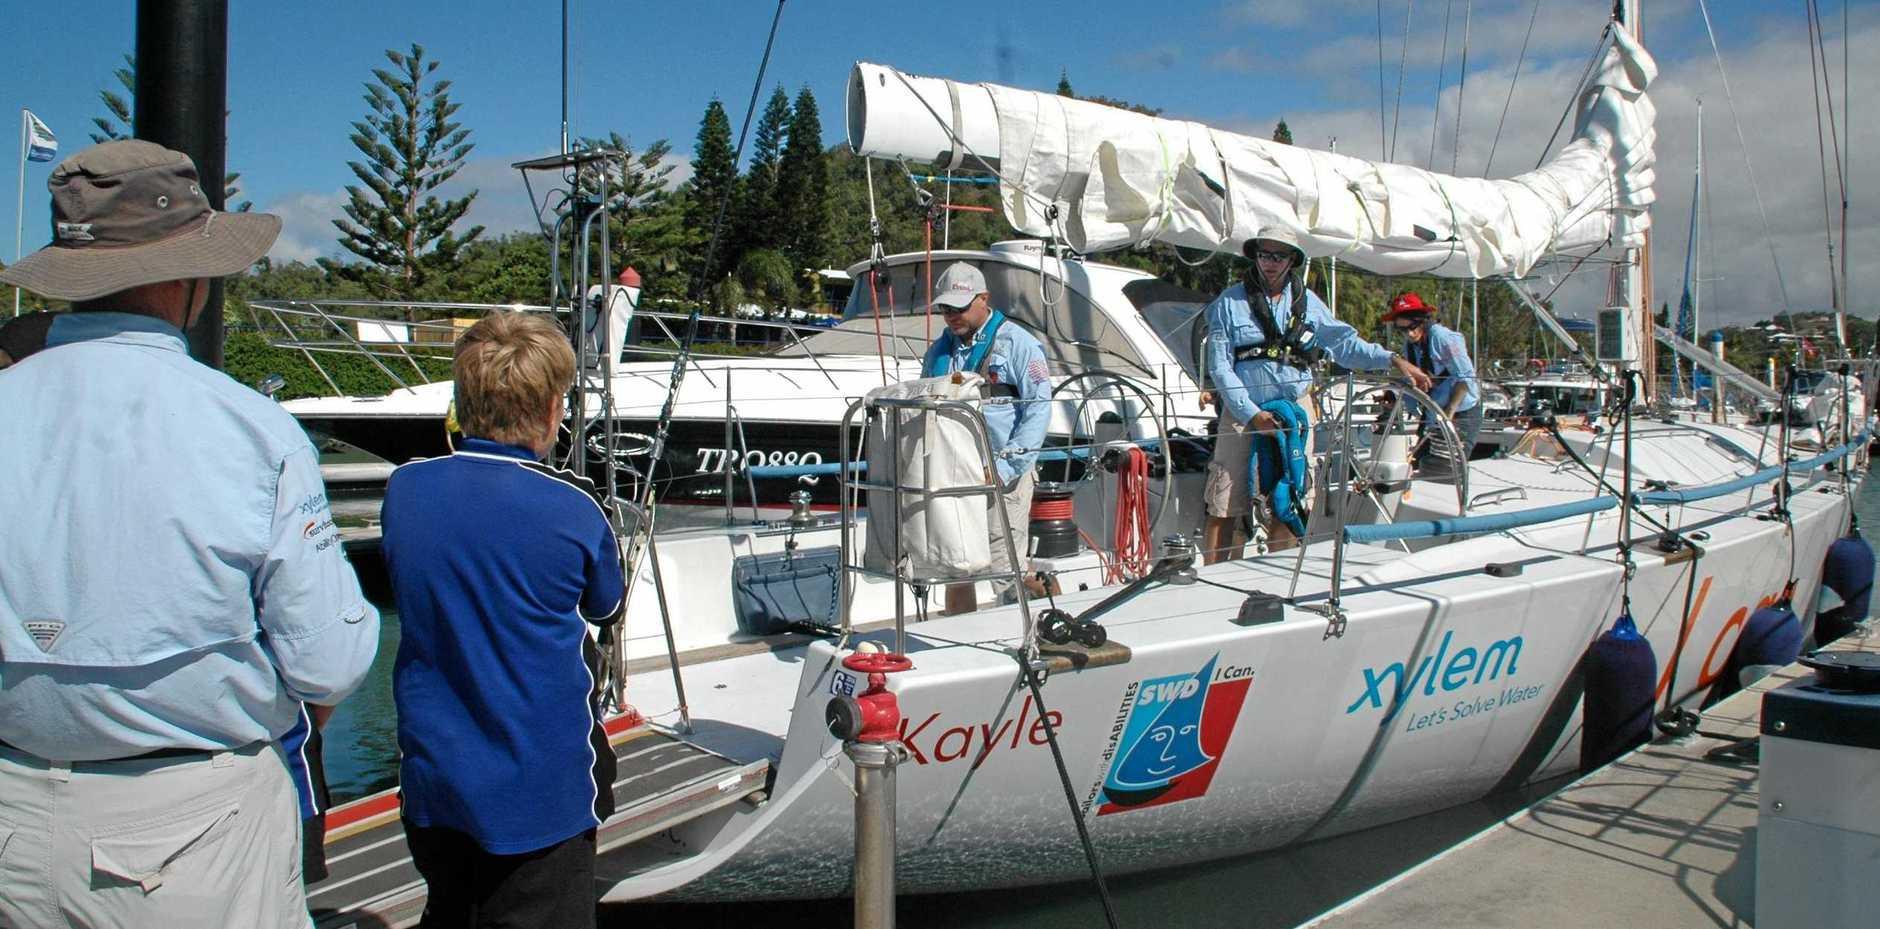 Sailors with disABILITIES Winds of Joy yacht, Kayle.